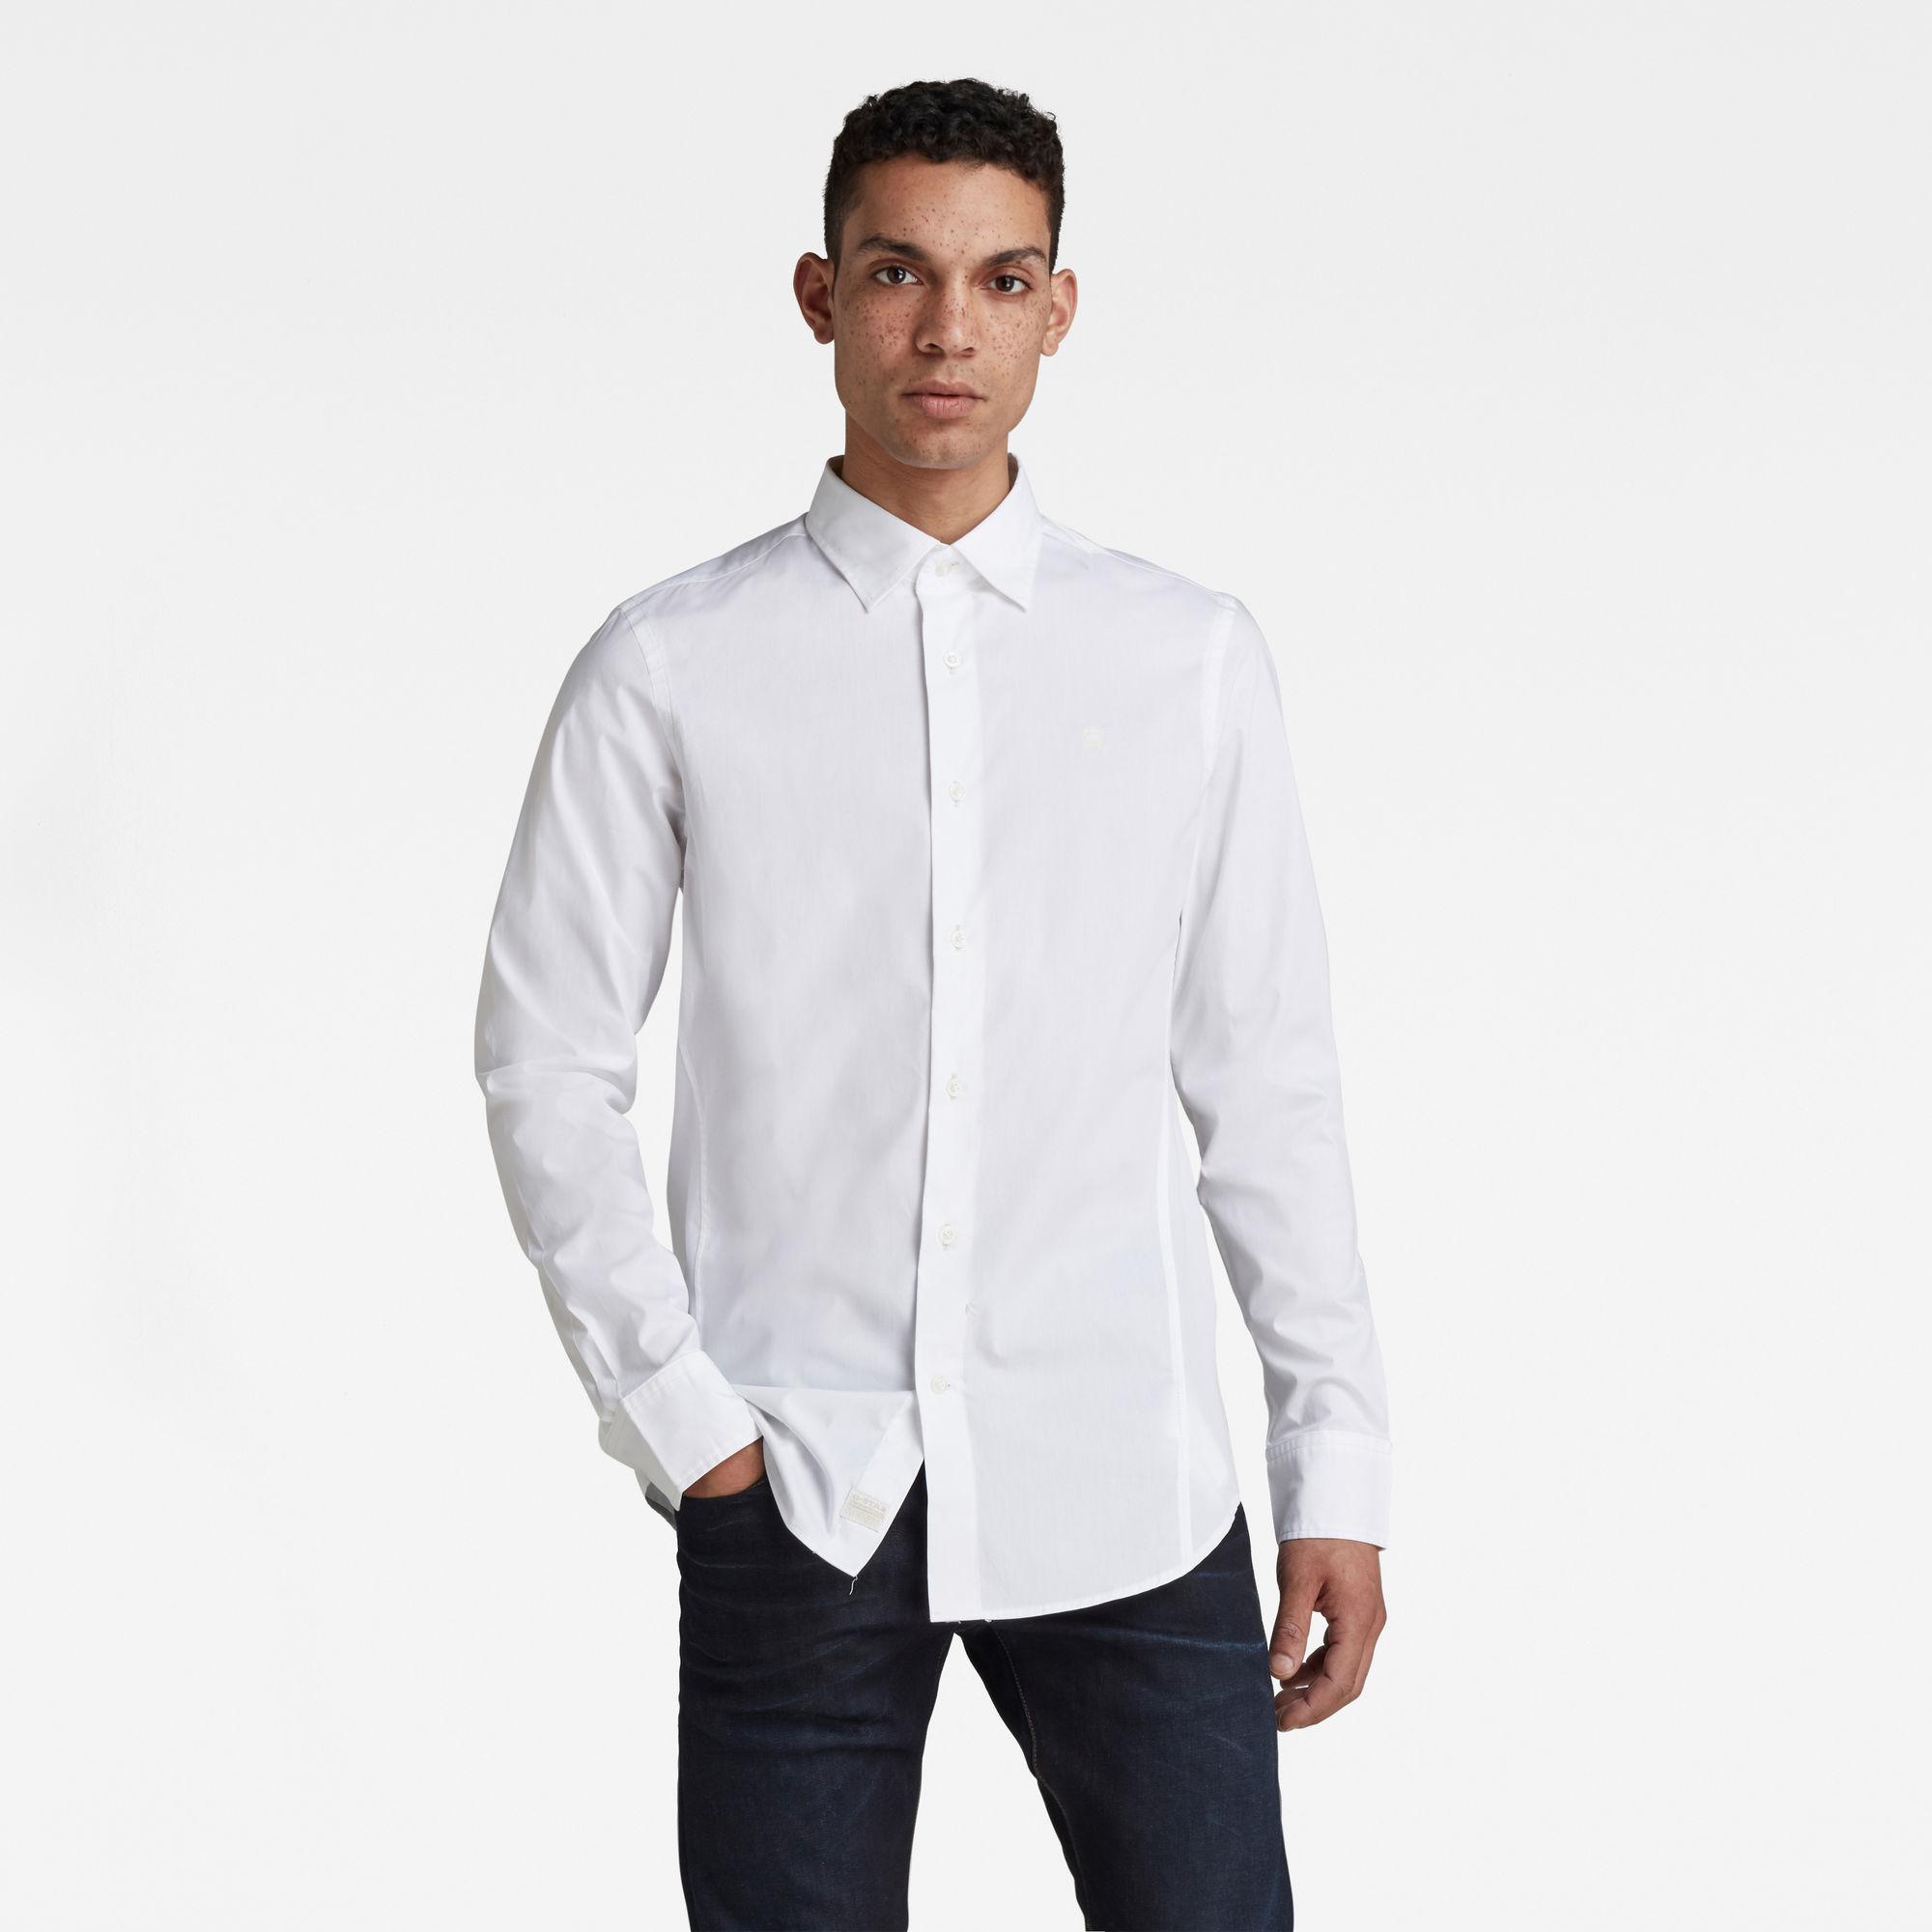 G-Star RAW Heren Dressed Super Slim Shirt Wit